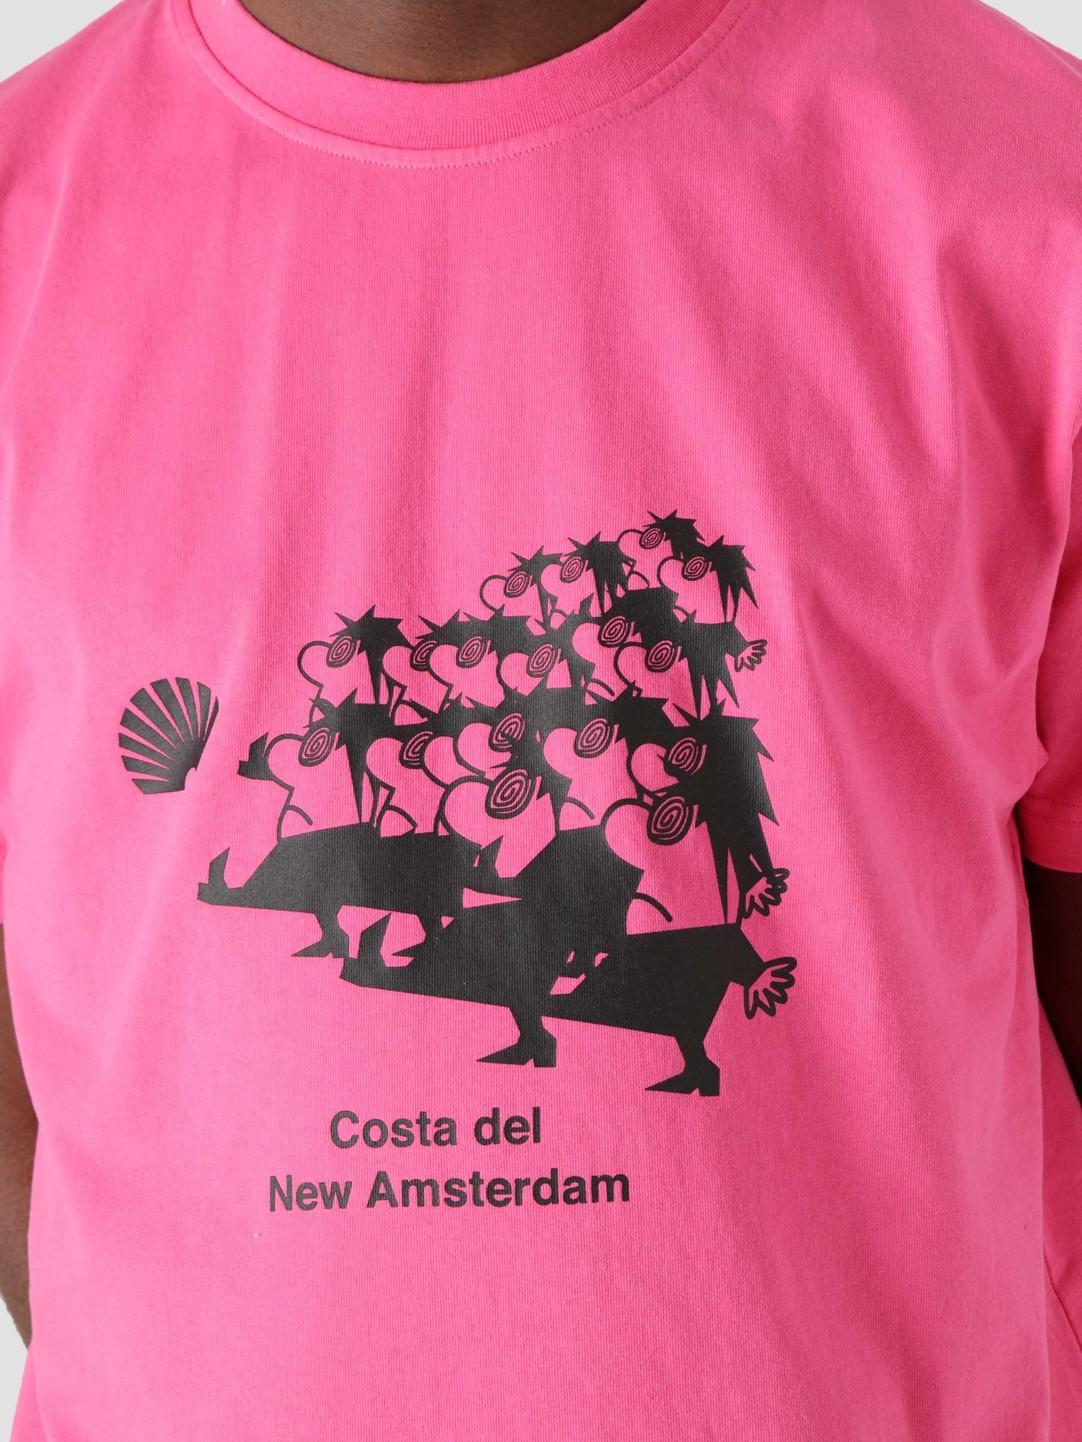 New Amsterdam Surf Association New Amsterdam Surf Association March Tee Pink 2021004